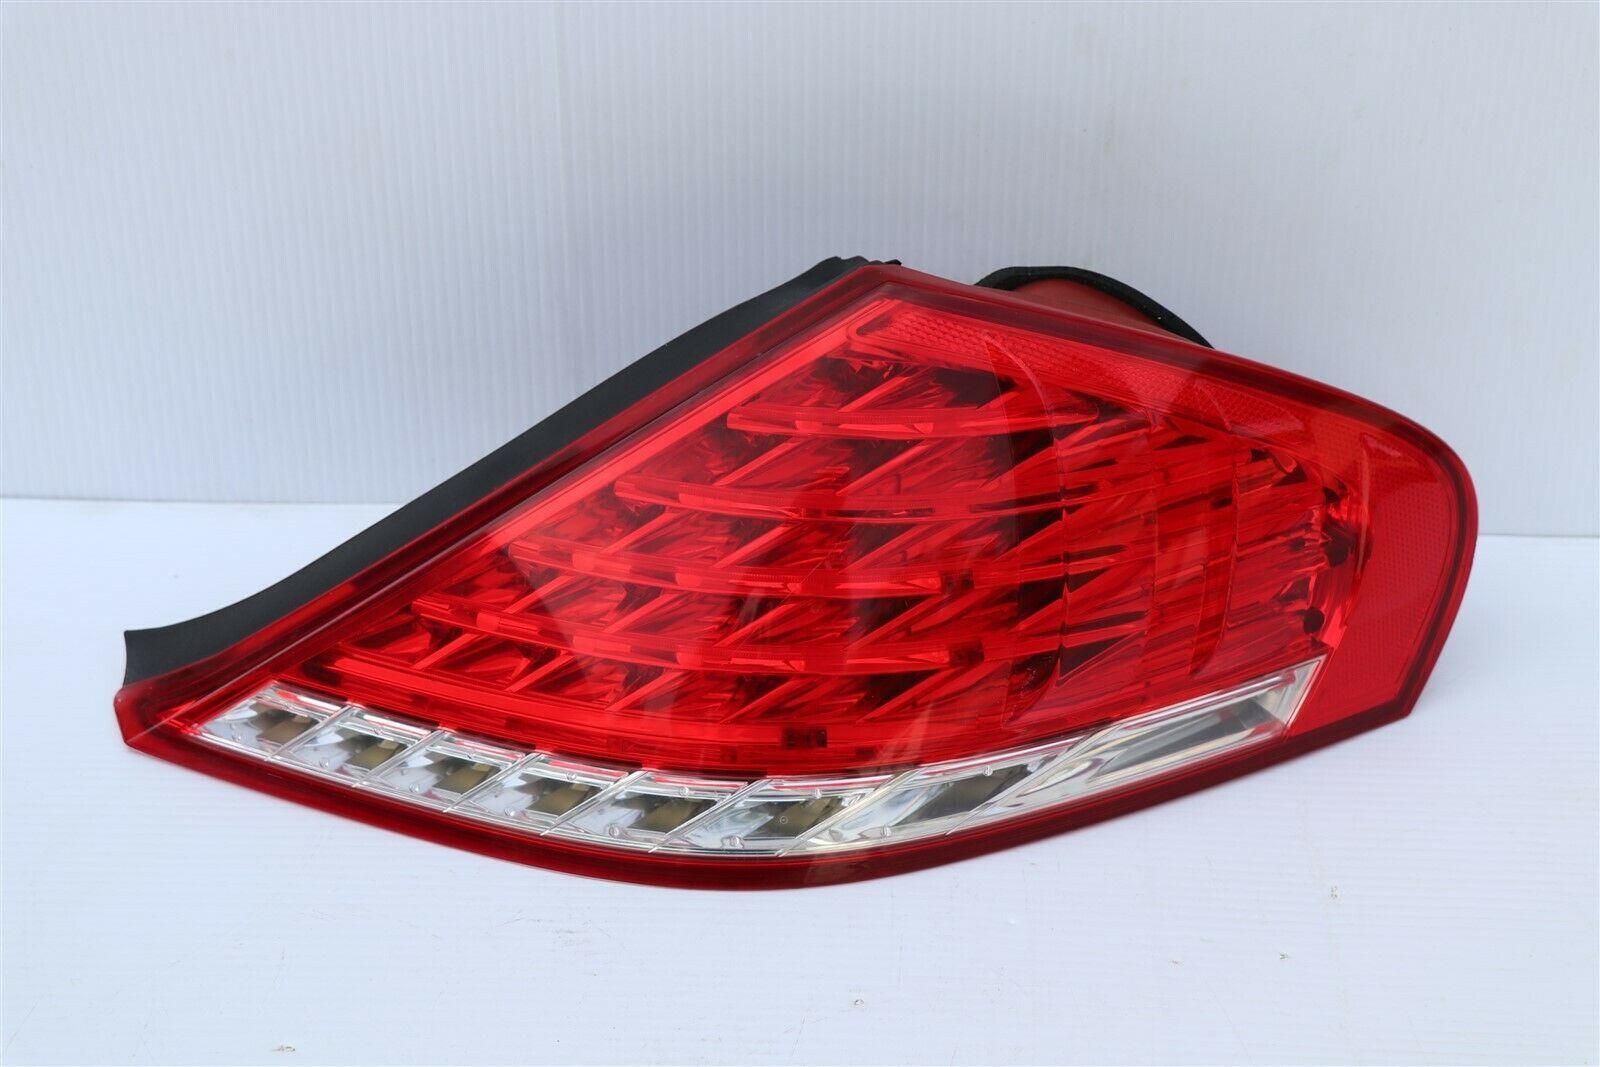 08-10 BMW E64 M6 650i LCI Outer LED Taillight Combo Lamp Passenger Right RH